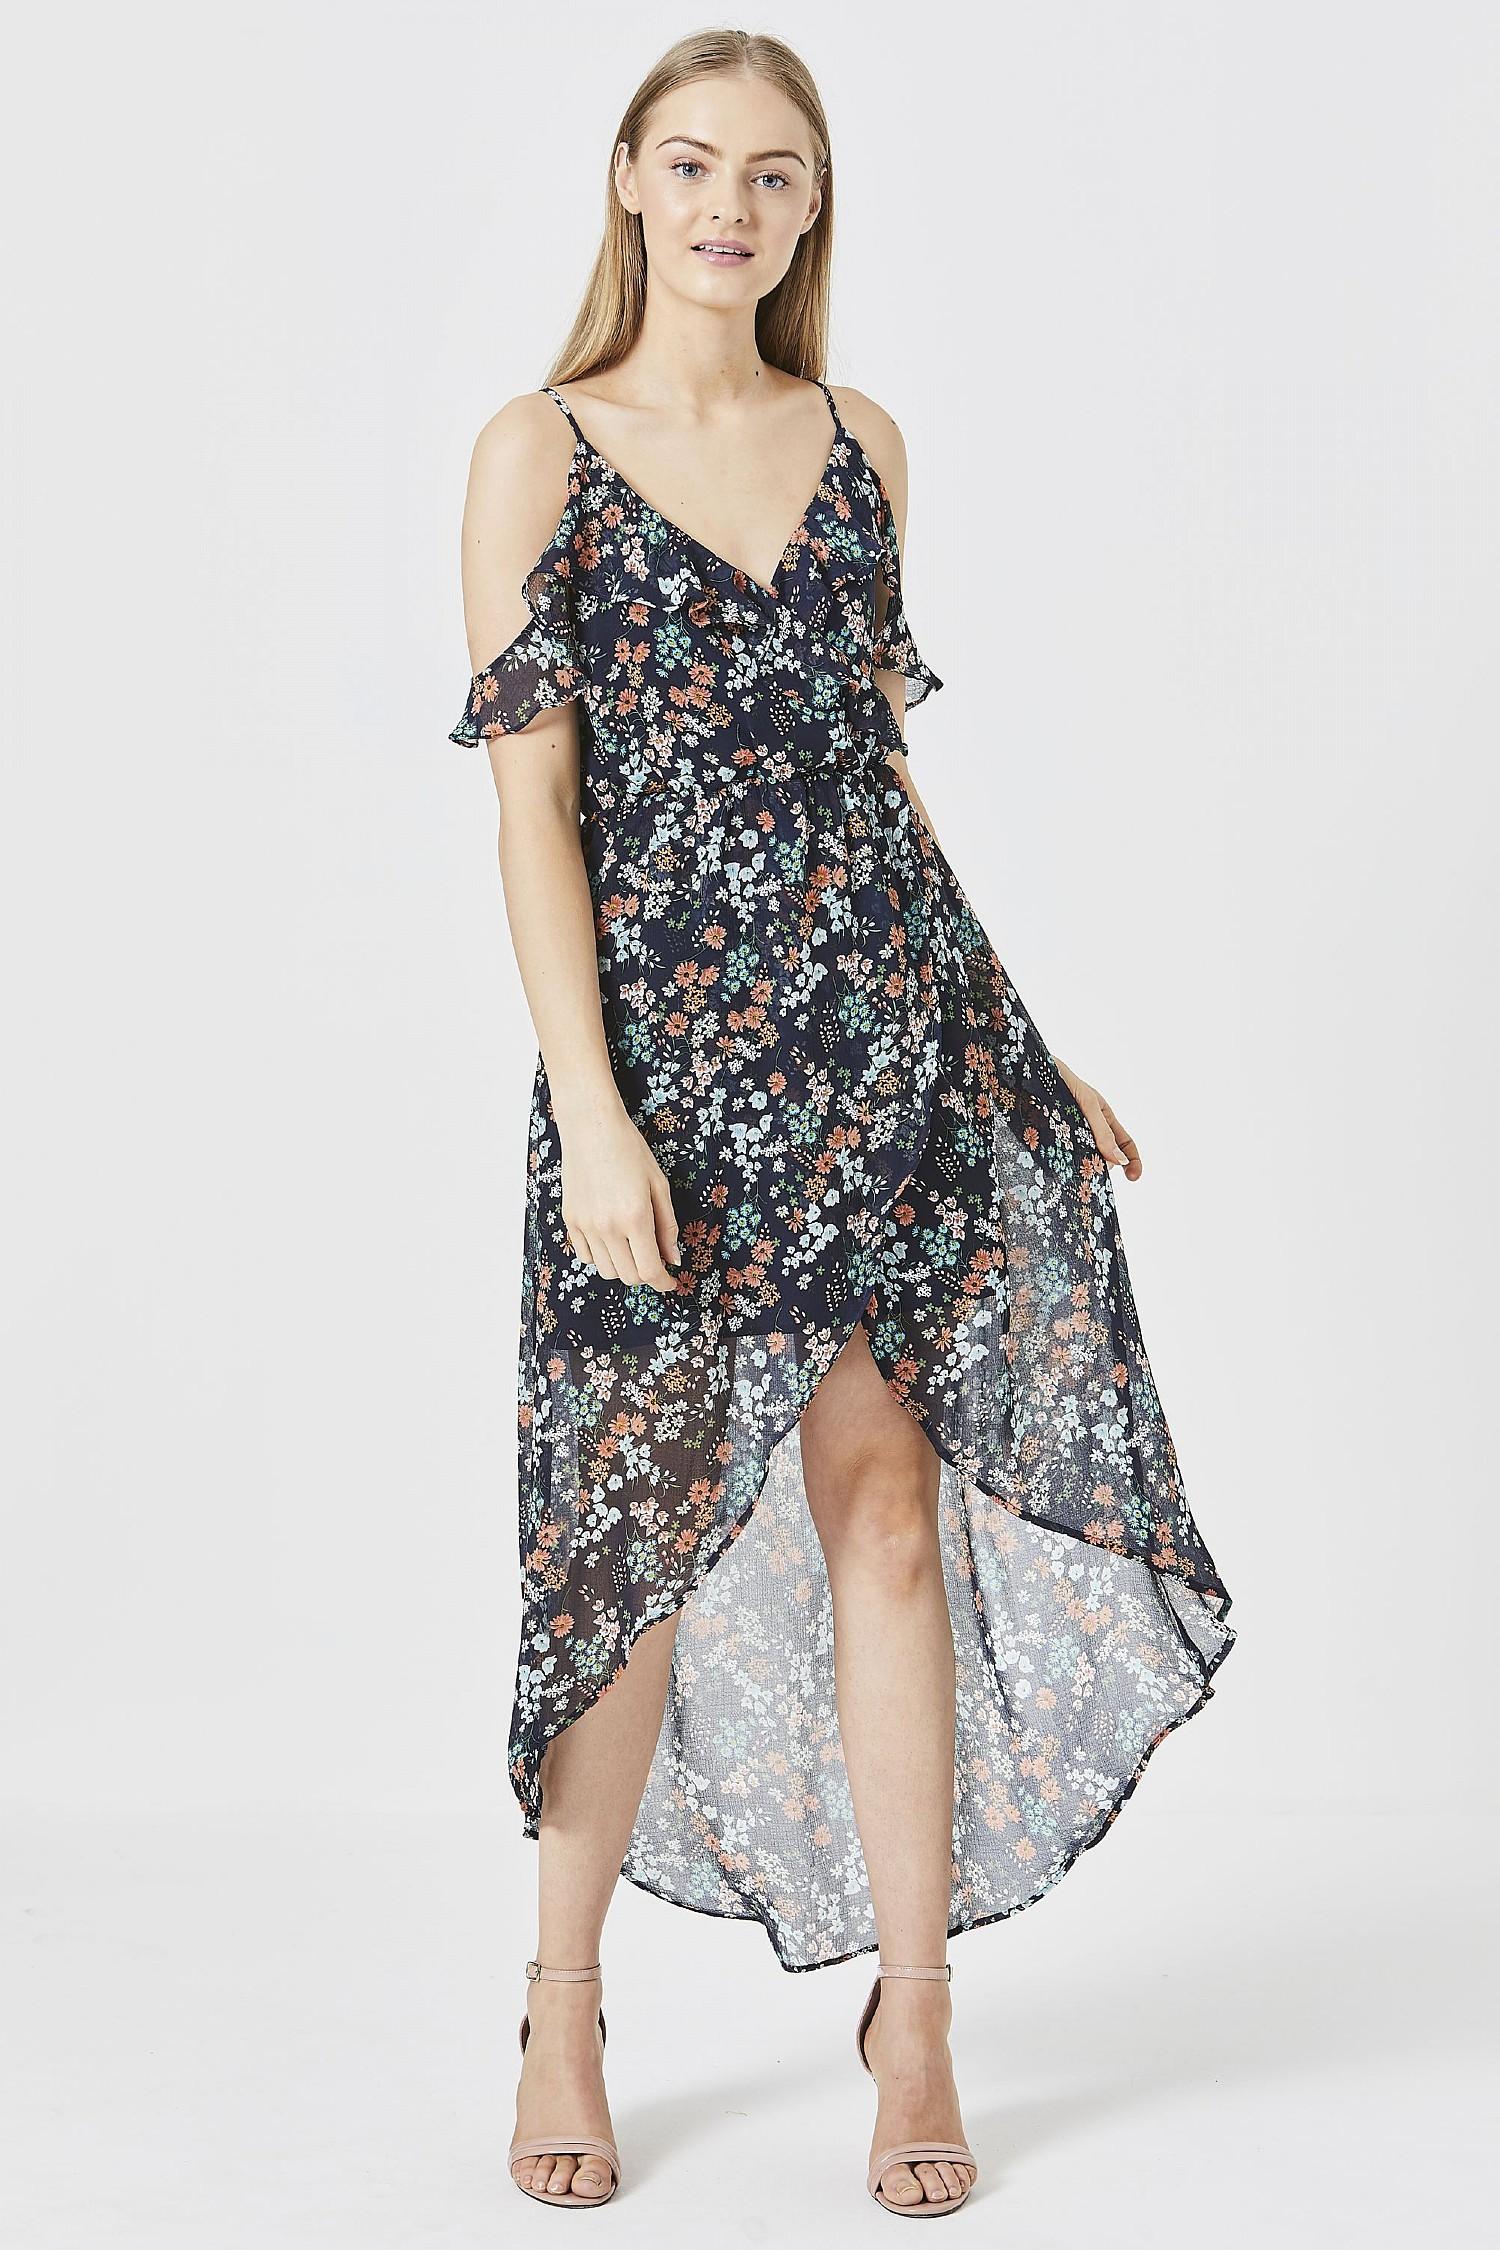 b3831fd9eaa13e ANGELEYE Navy Floral Ruffled Cami Dress